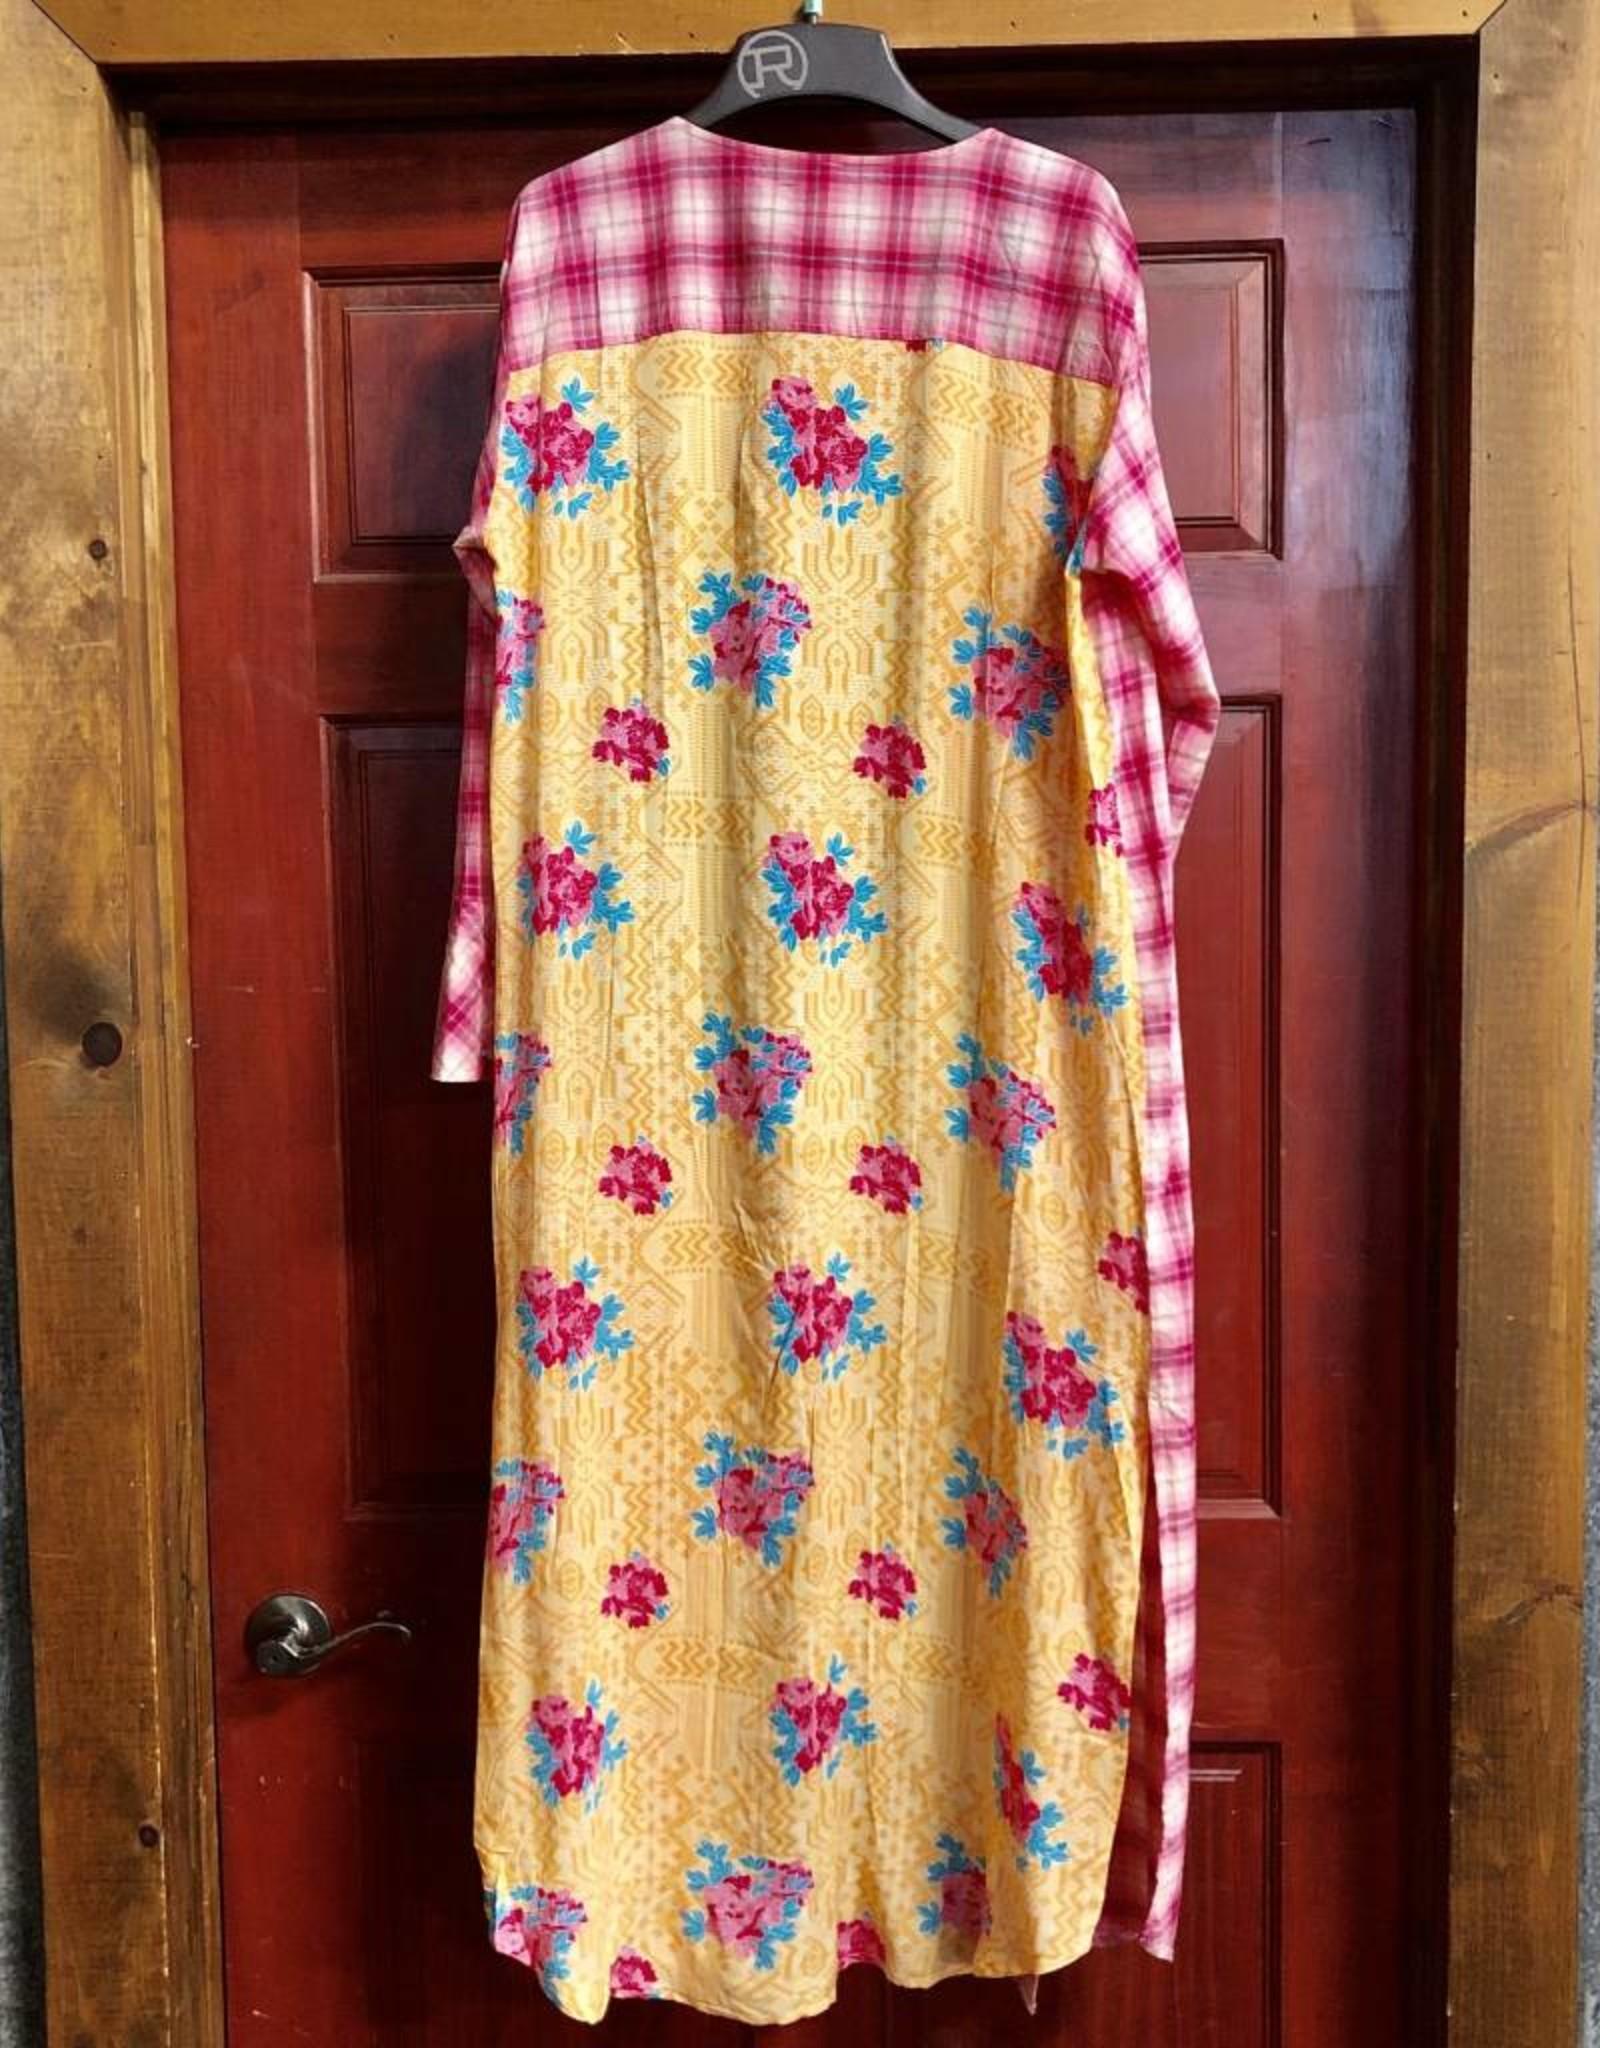 ROPER WMS ROPER DRESS JACKET PINK PLAID L/S